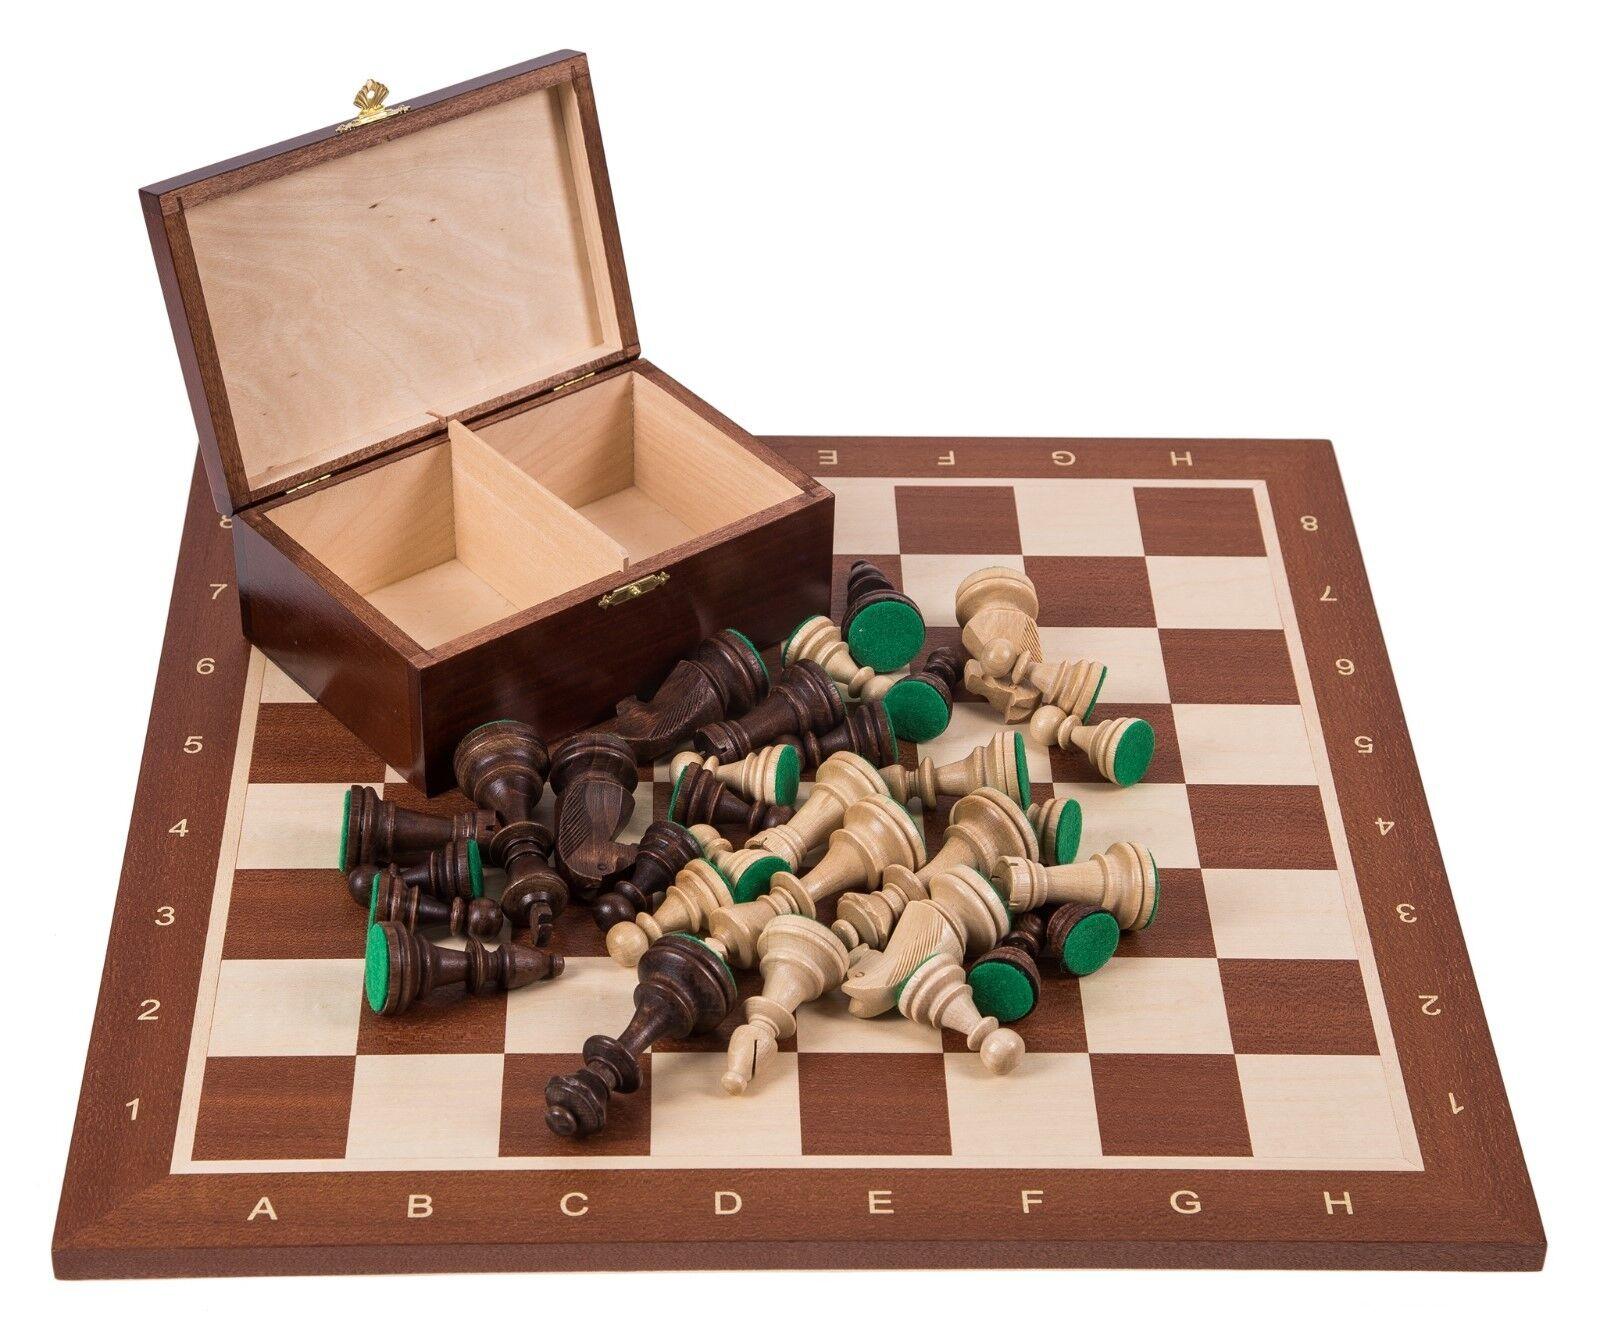 Square-Pro boisen Chess Set No 6-Mahogany-chessboard boisen  + Staunton  pour la vente en gros